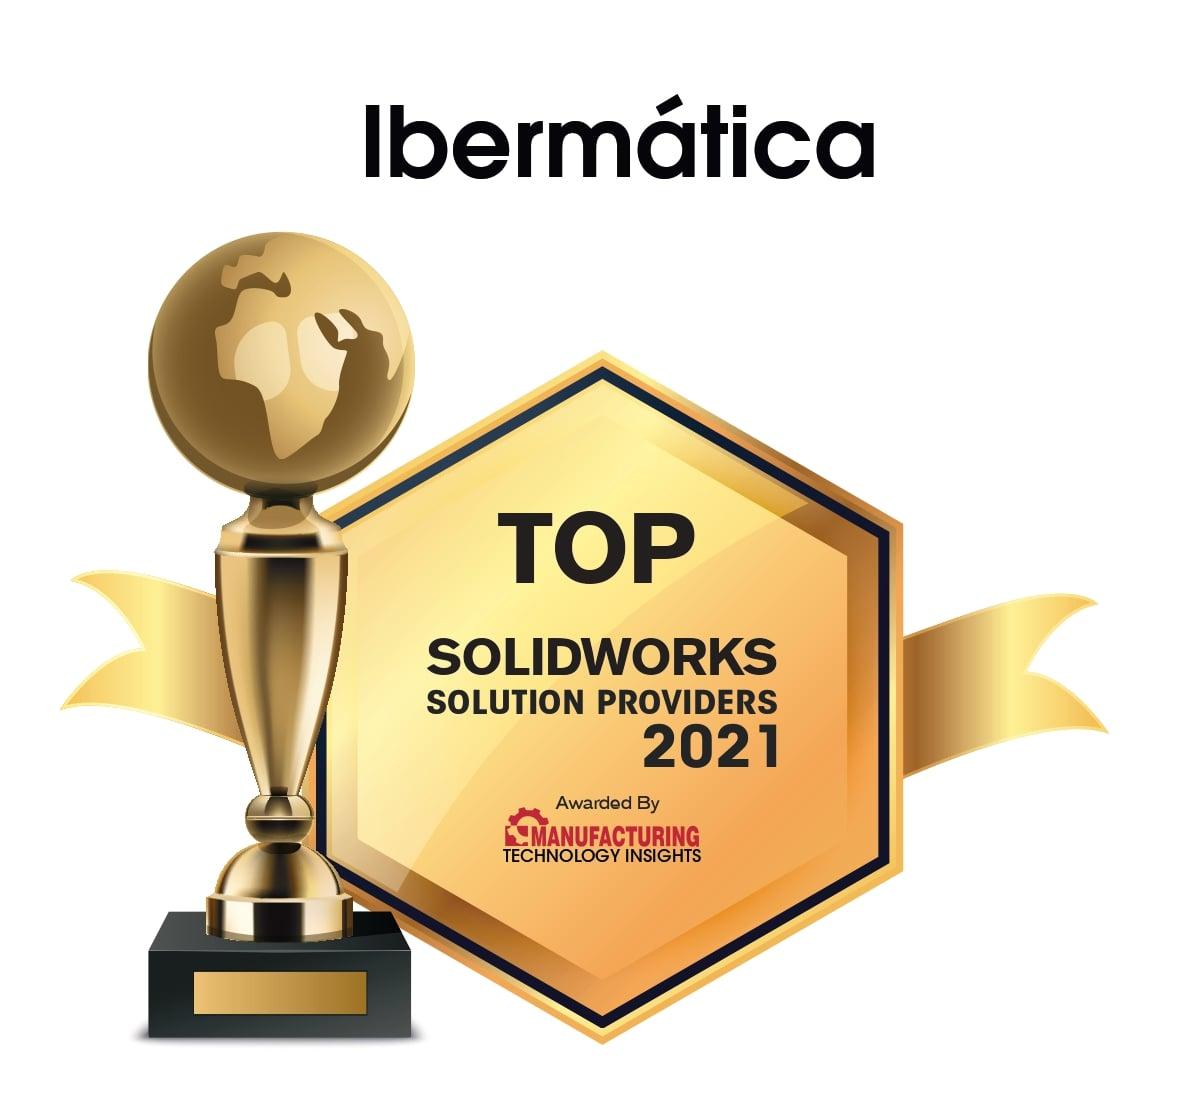 Ibermática TOP 10 Reseller SOLIDWORKS & 3DEXPERIENCE